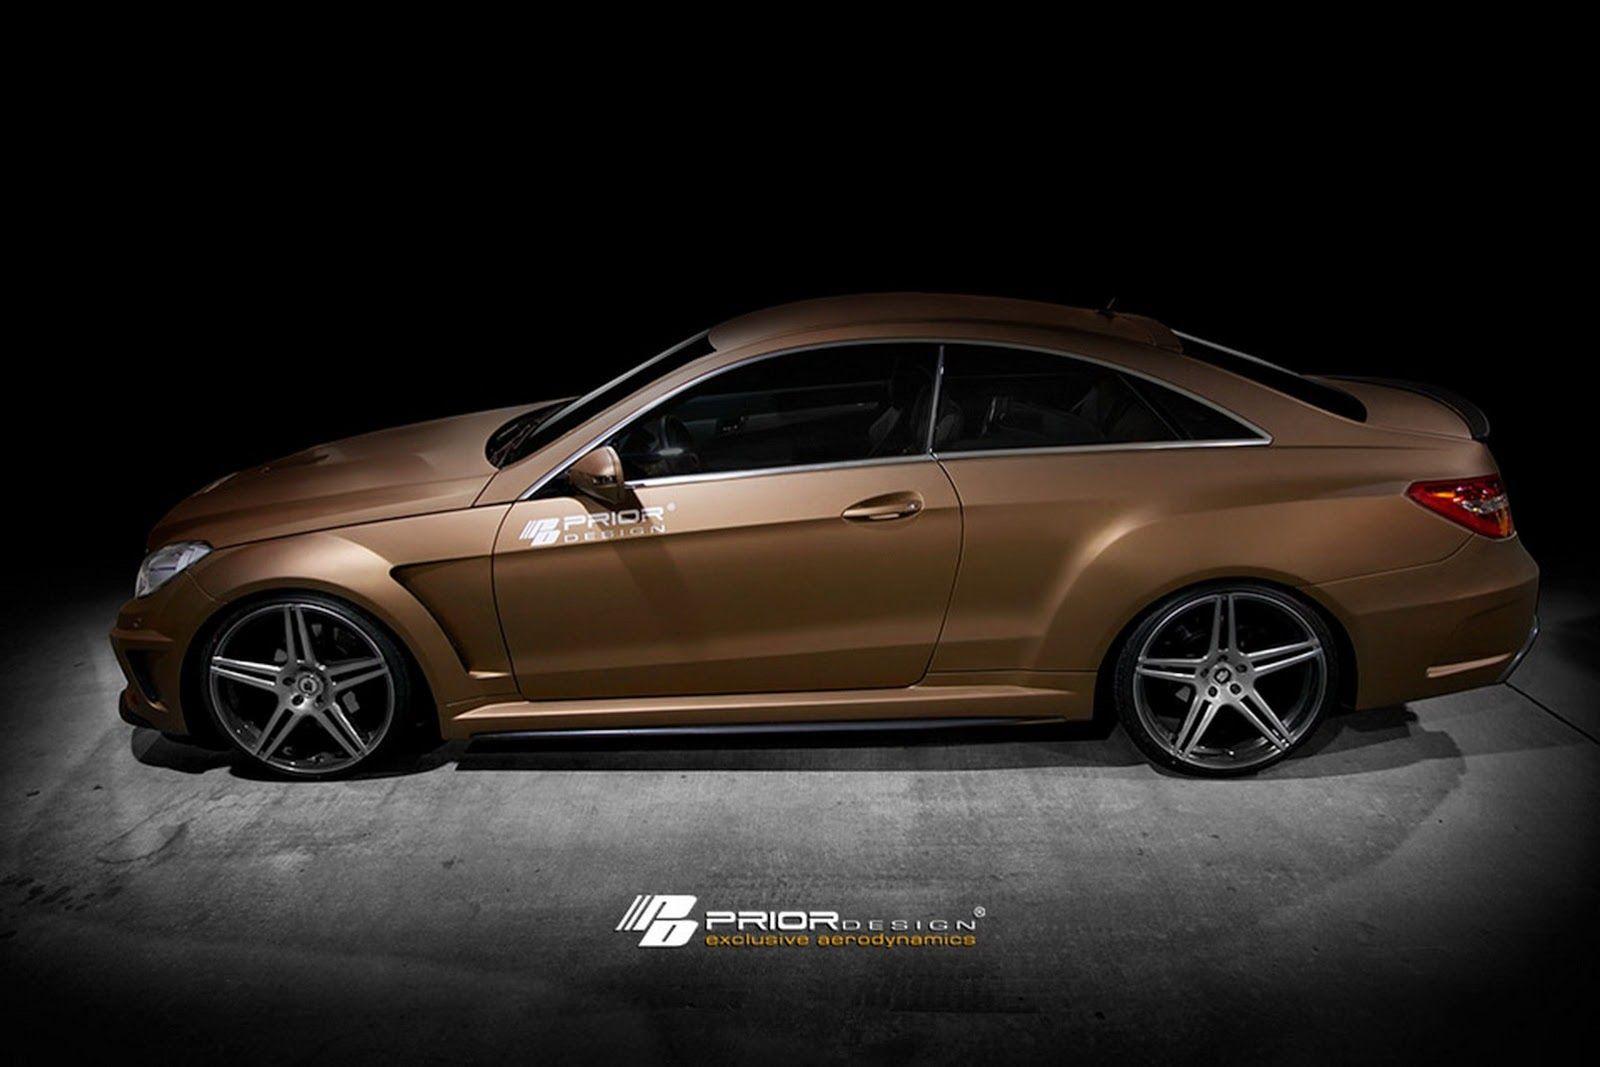 Prior design tune for prior facelift mercedes benz e class coupe carscoops